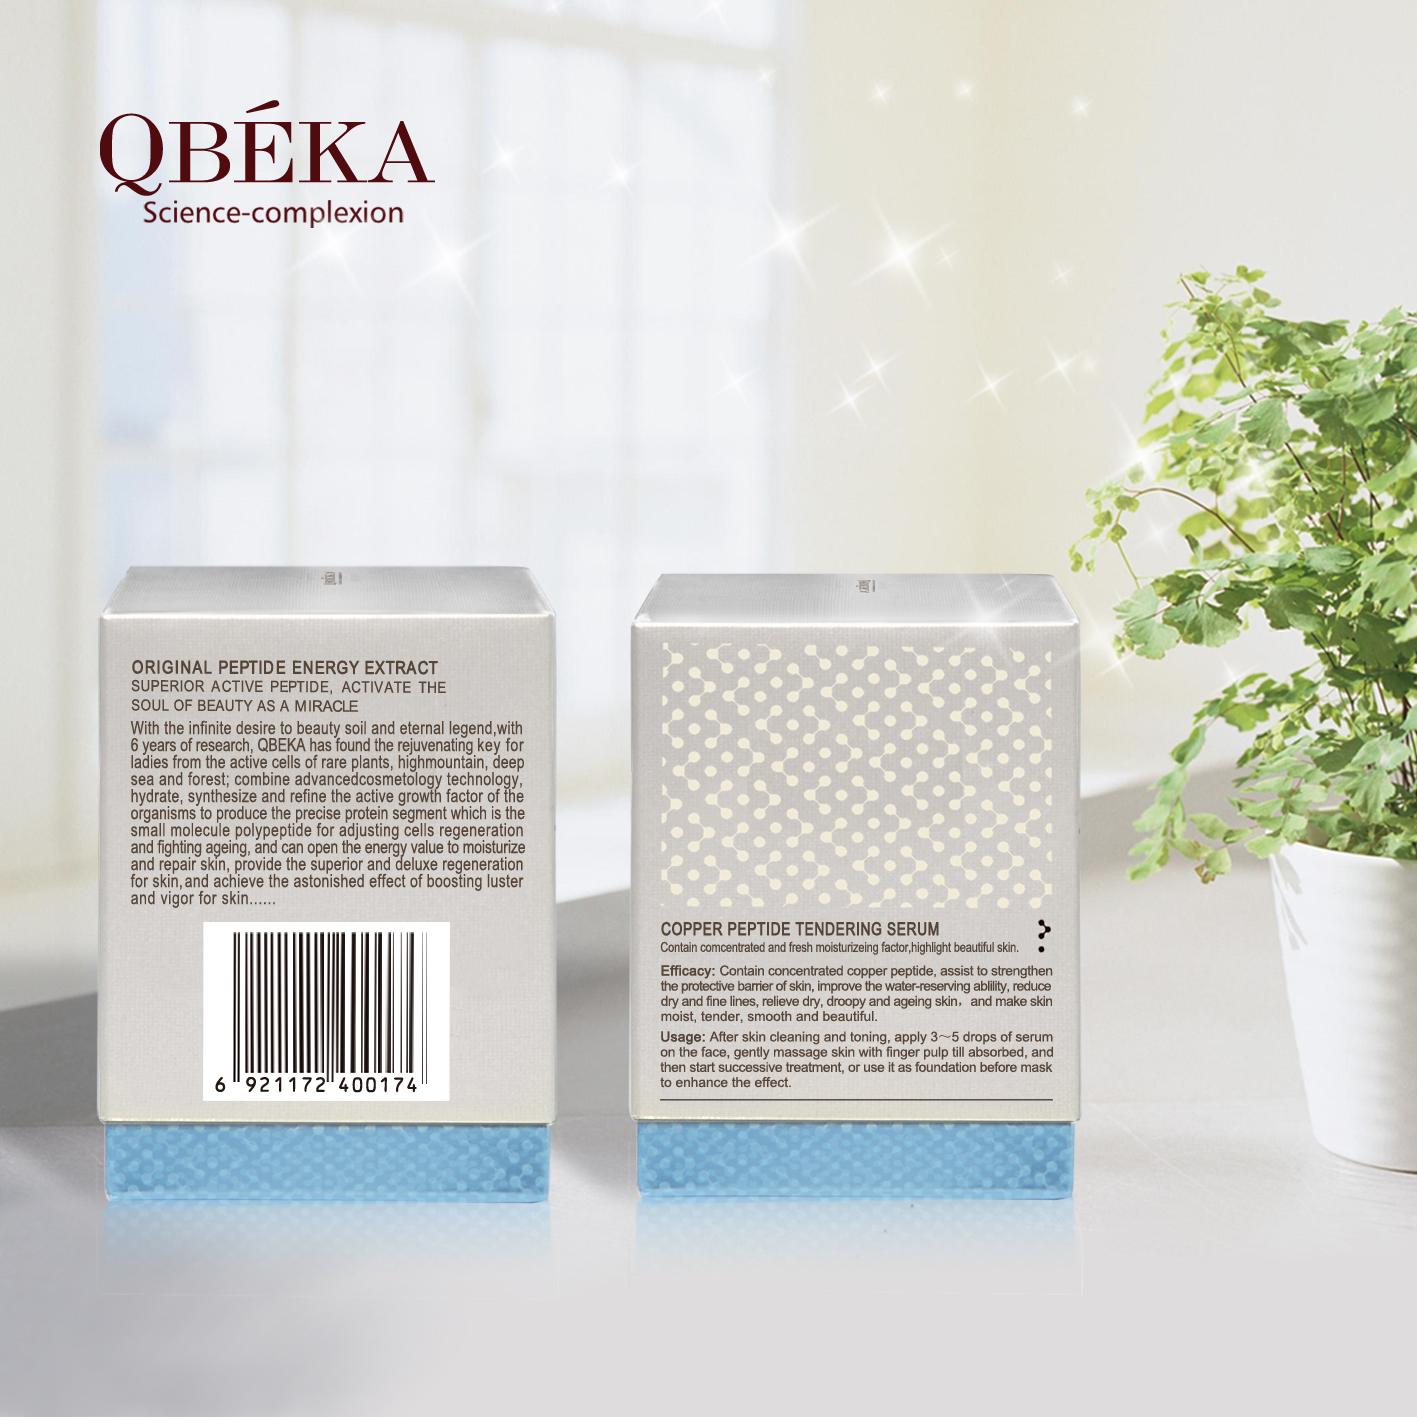 Tendering Anti-Aging serum QBEKA Copper Peptide Tendering Anti-Aging Set